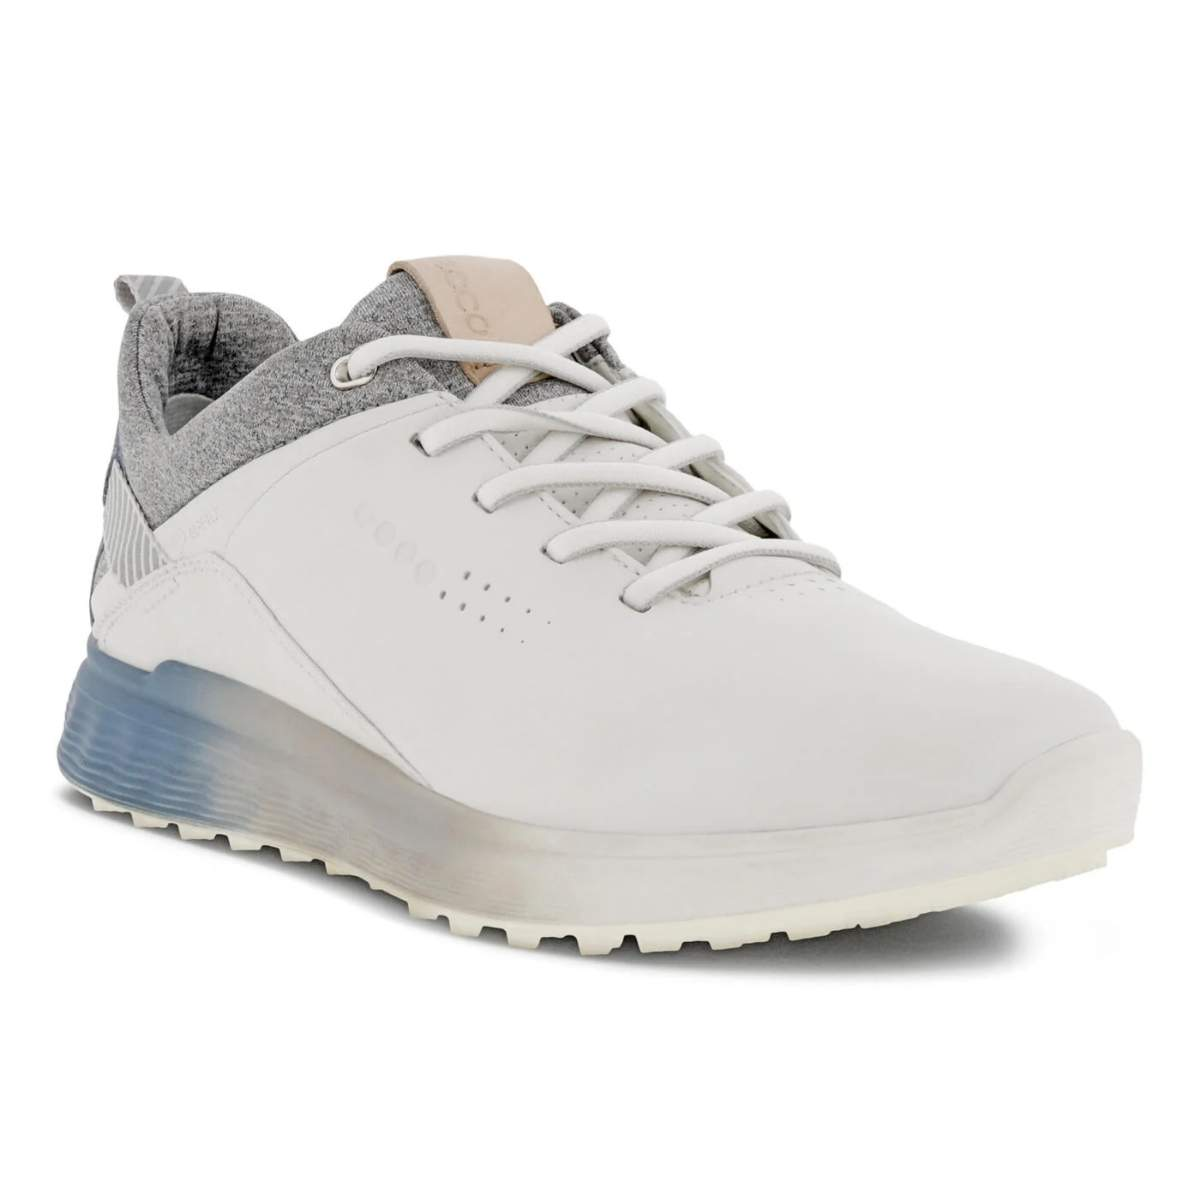 ECCO Women's S-Three Spikeless Golf Shoe